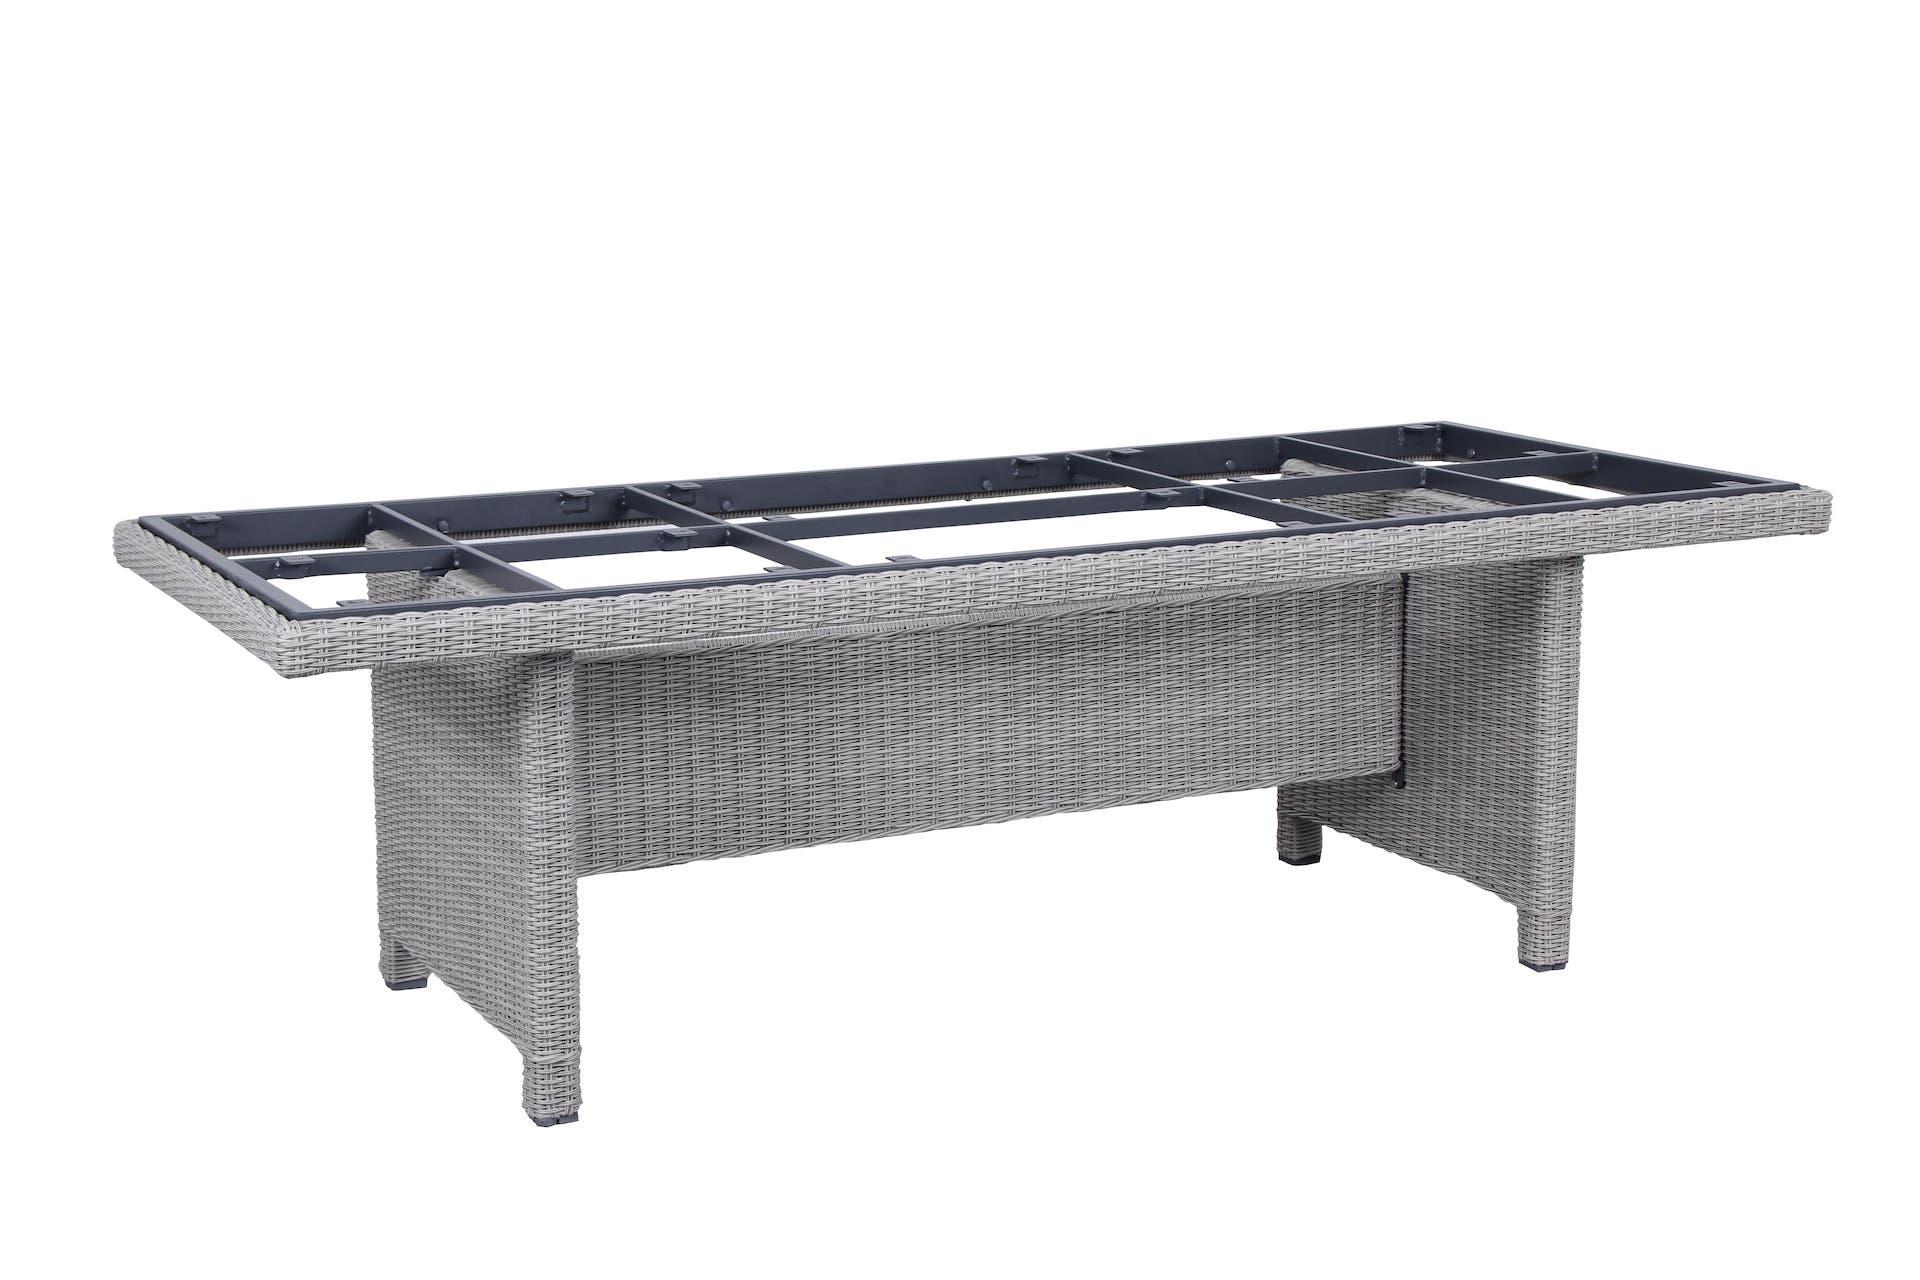 PALMA MODULAR Casual Dining Tischgestell 220 x95 cm